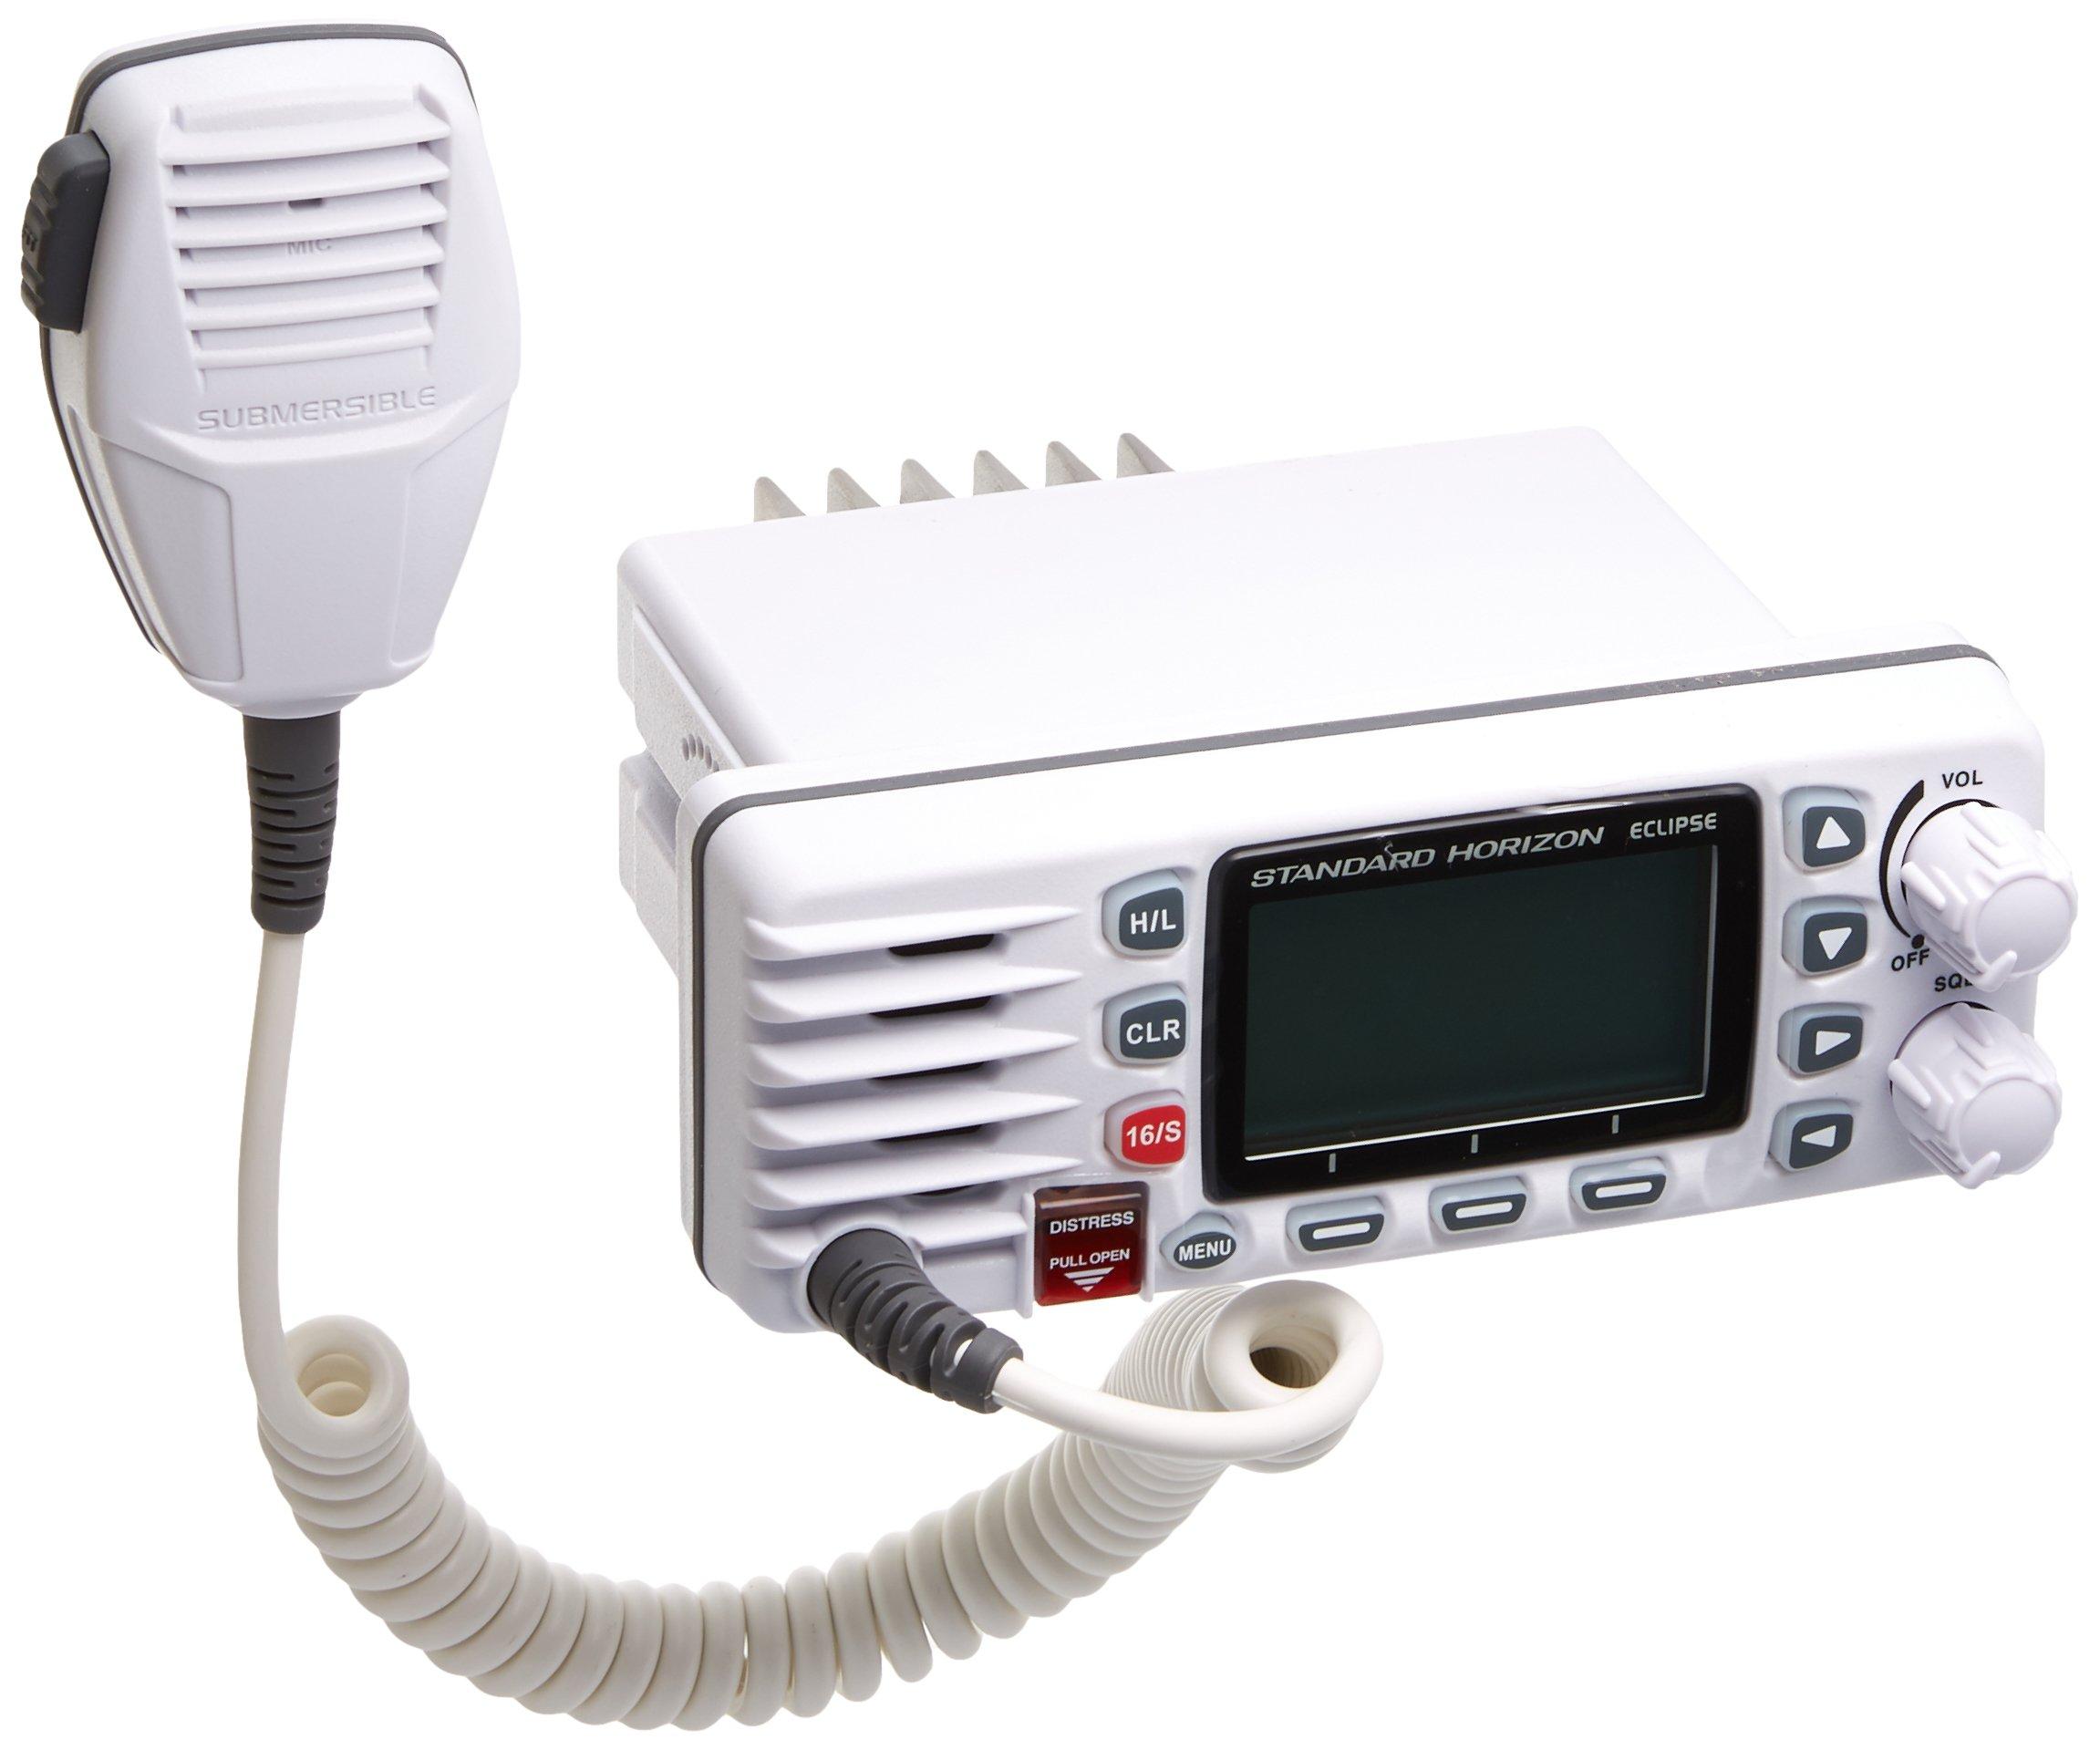 Standard Horizon GX1300W Eclipse GX1300B Fixed Mount VHF Radio (White) by Standard Horizon